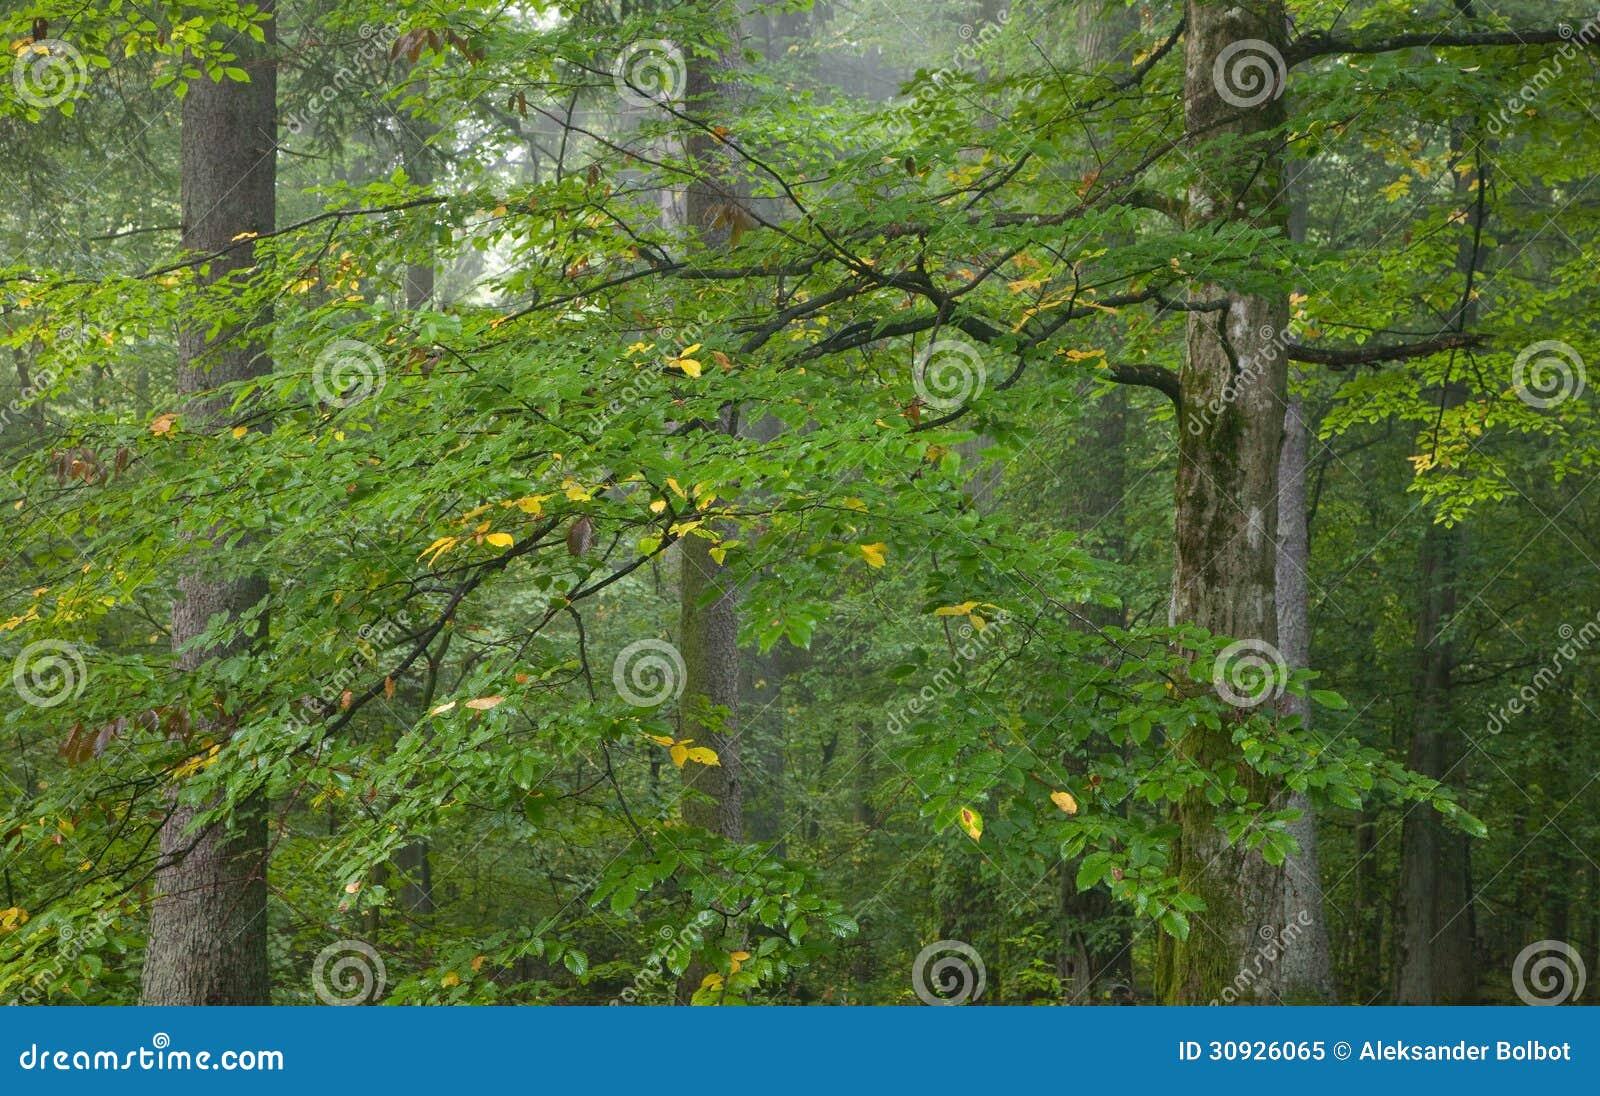 branche humide d 39 arbre de charme photo libre de droits image 30926065. Black Bedroom Furniture Sets. Home Design Ideas